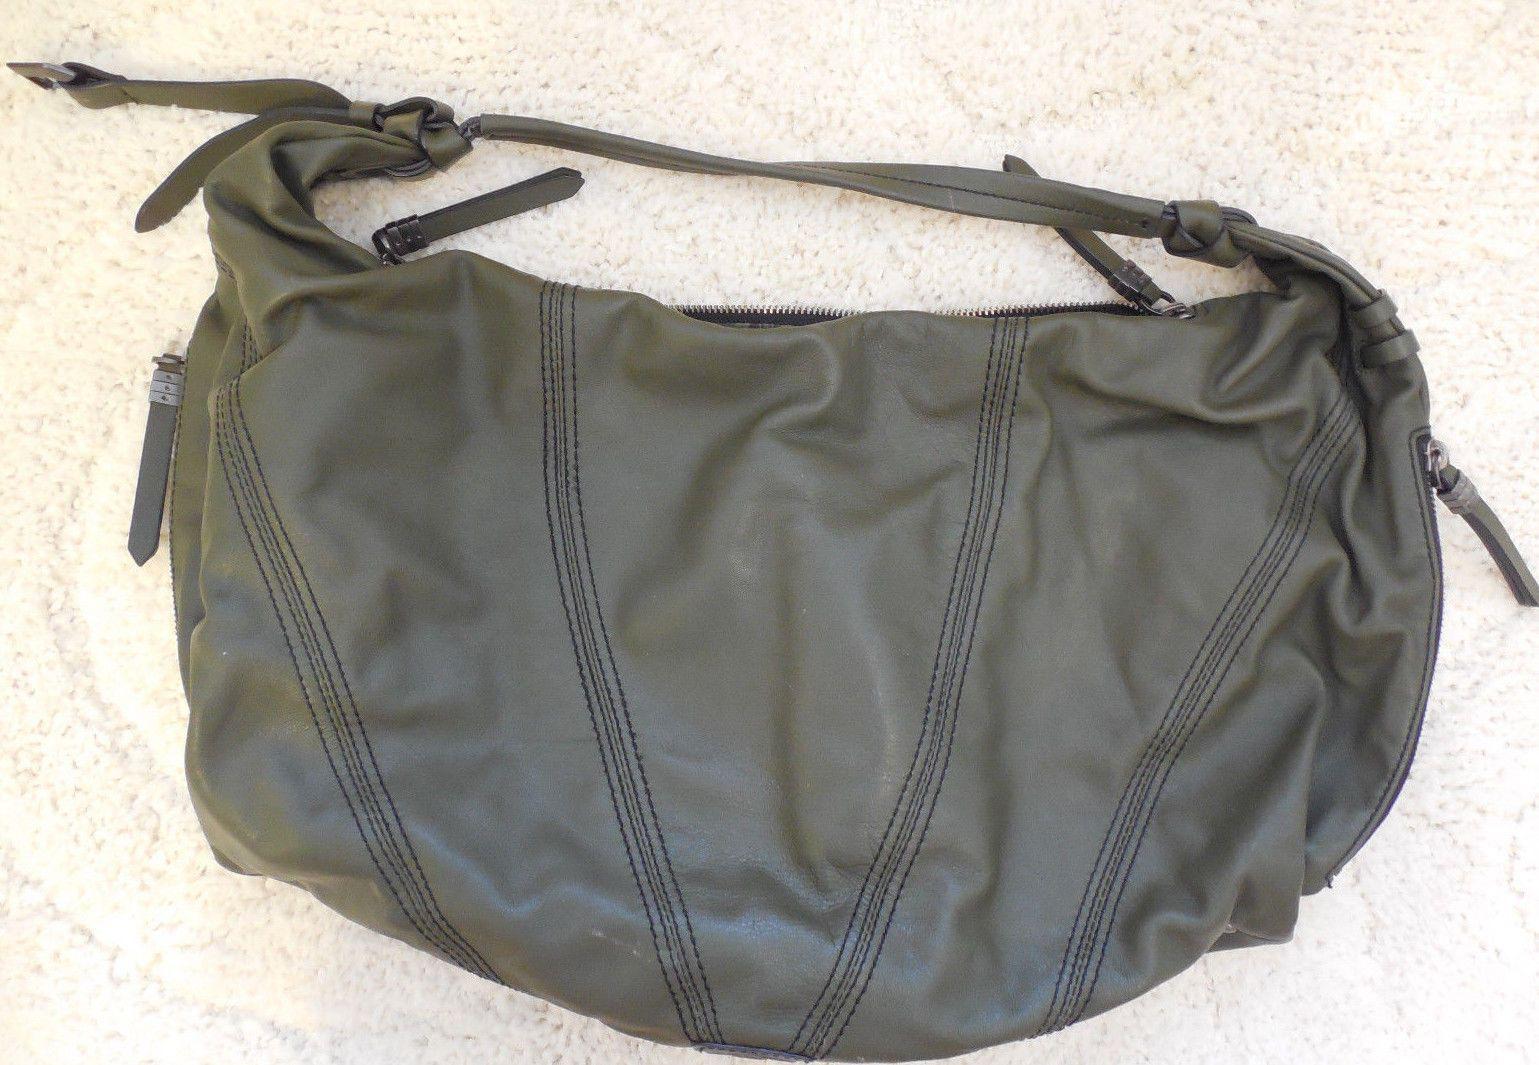 dabb872c059e Oryany Handbag Green Leather Hobo XXL Shoulder bag  lots of zipper  compartments  75.0